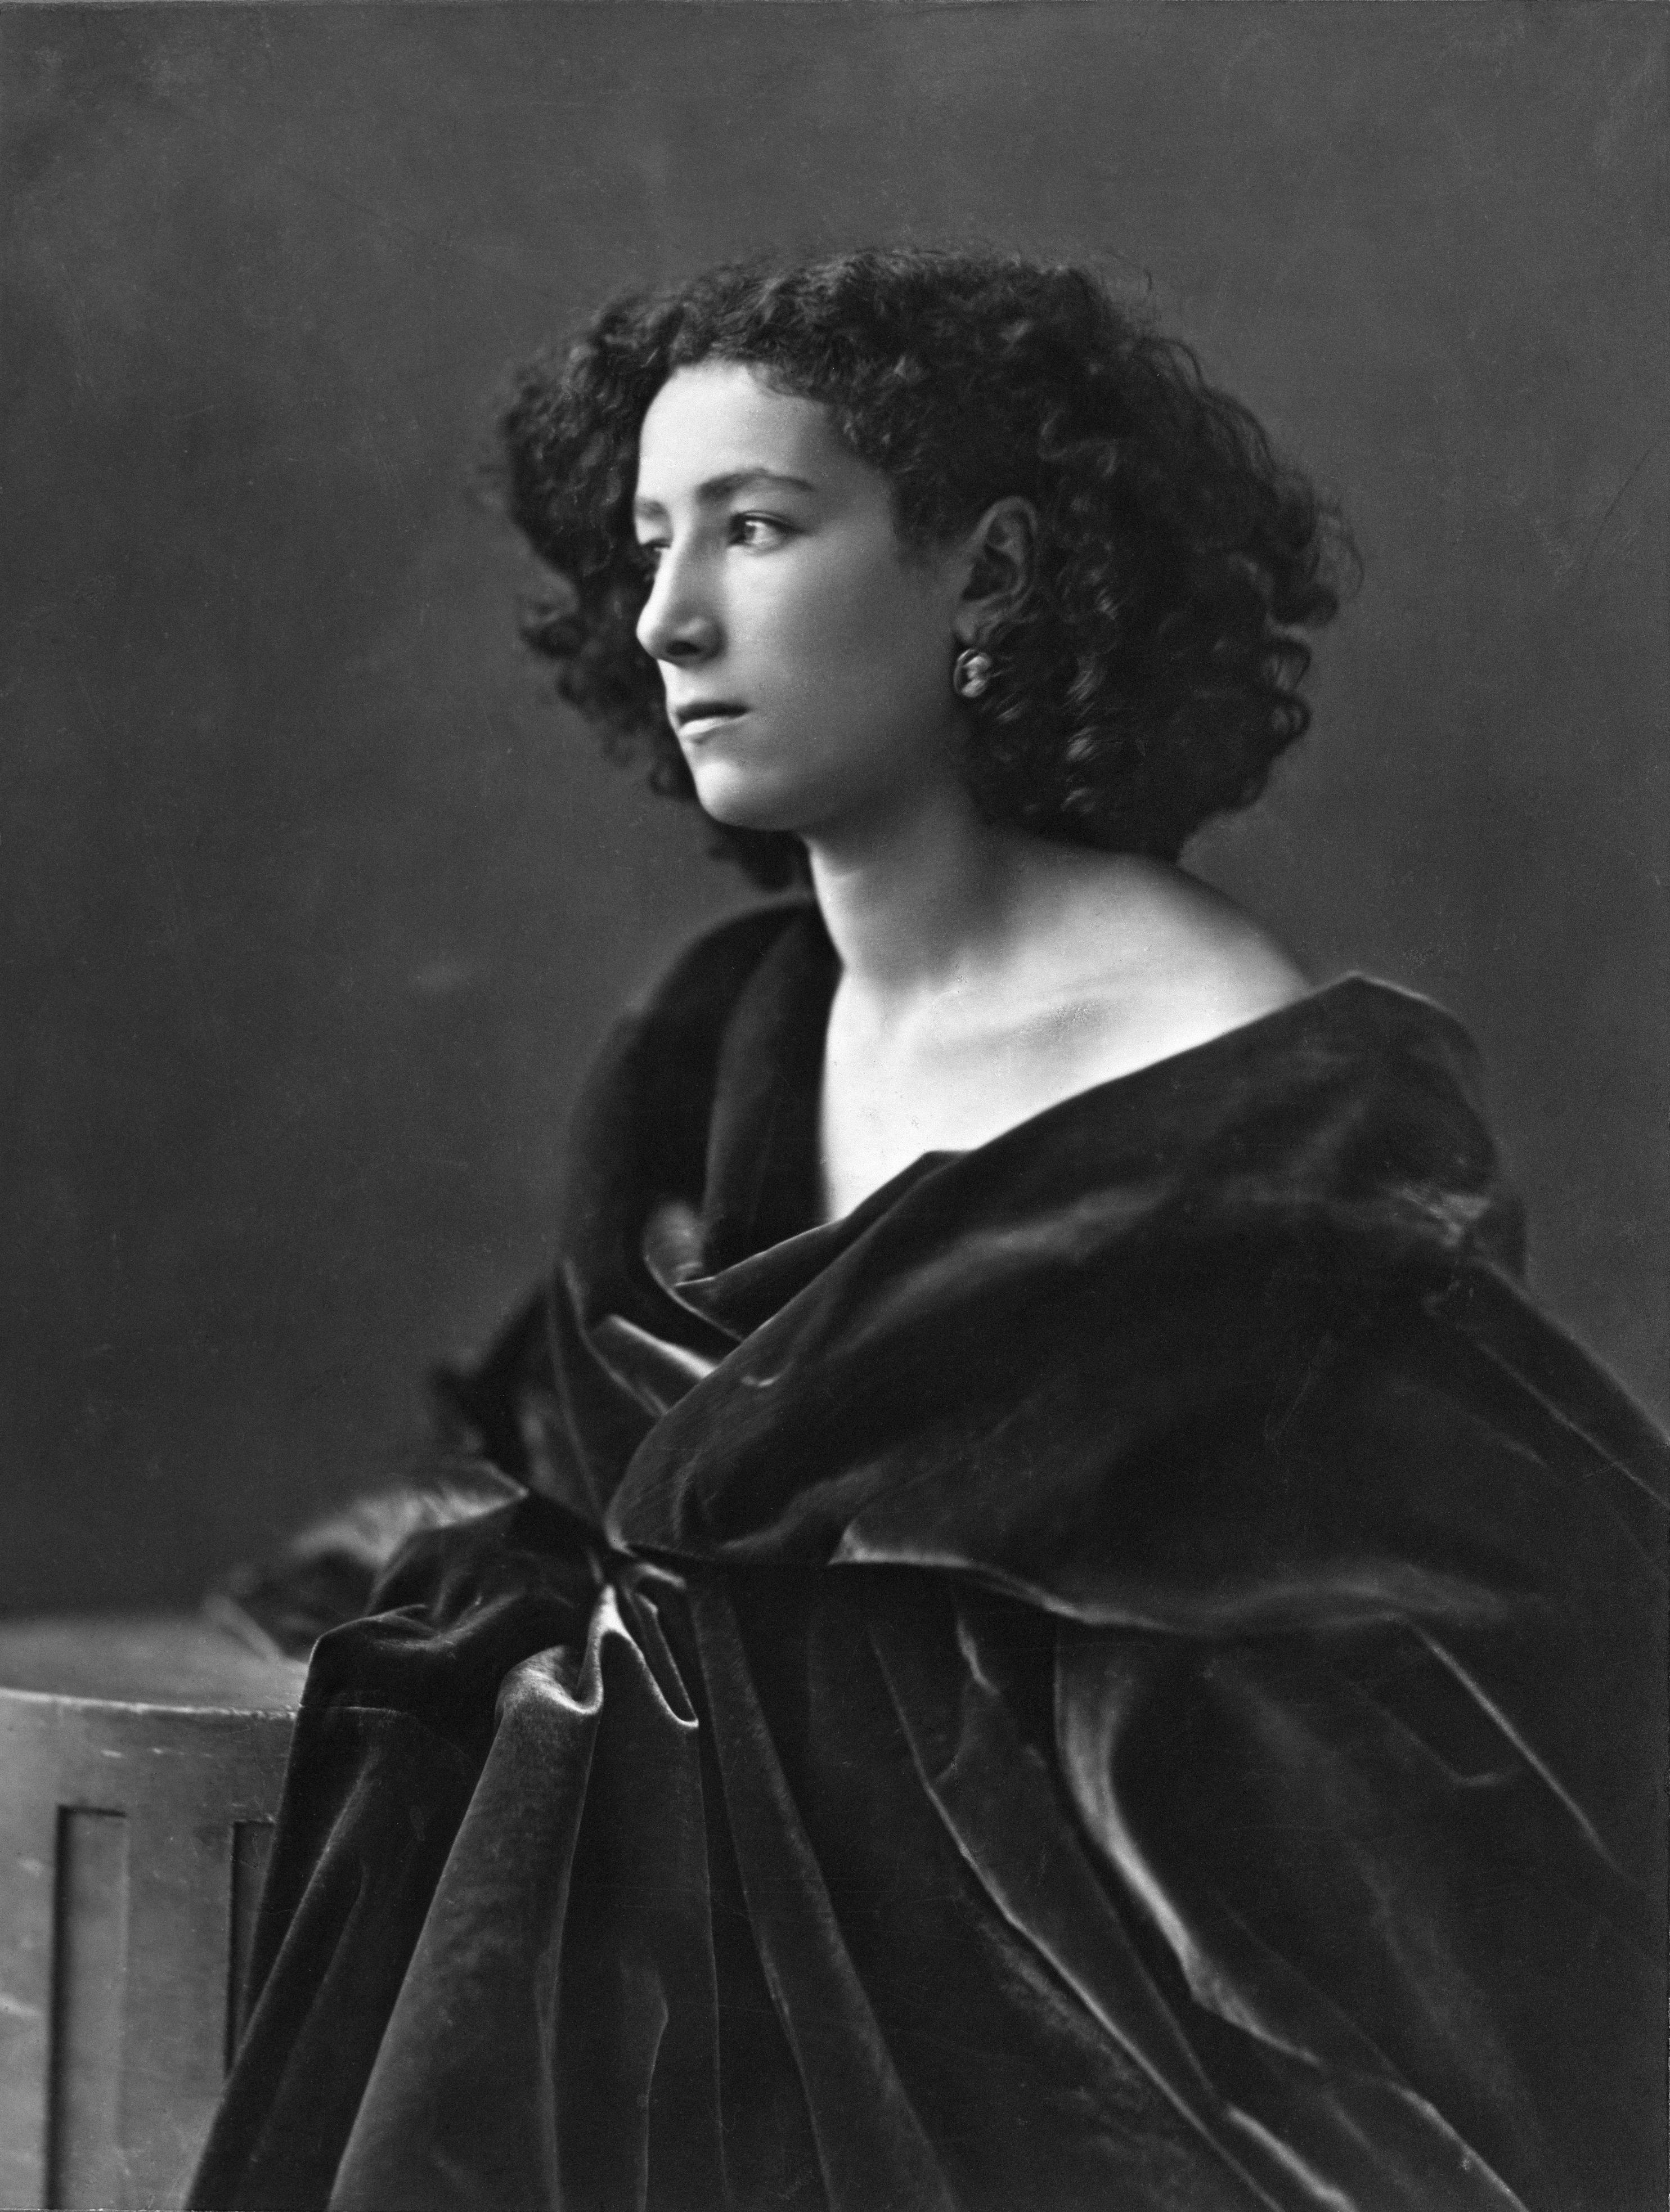 http://upload.wikimedia.org/wikipedia/commons/3/3b/Sarah_Bernhardt,_par_Nadar,_1864.jpg